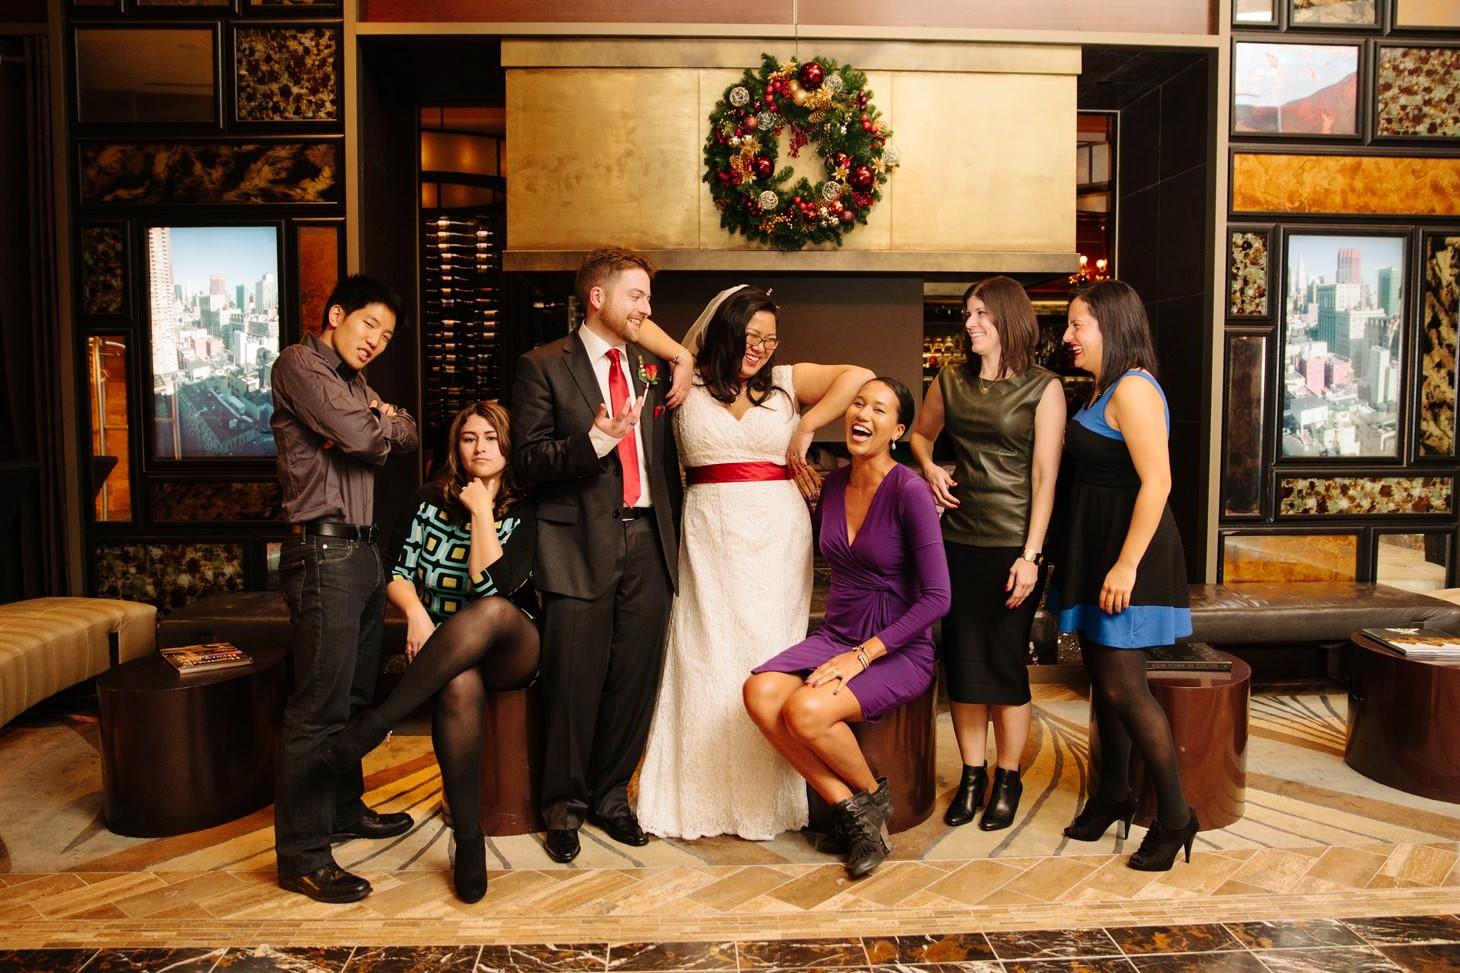 055-nyc-wedding-portrait-photographer-times-square-muse-hotel-winter-wedding-smitten-chickens.jpg